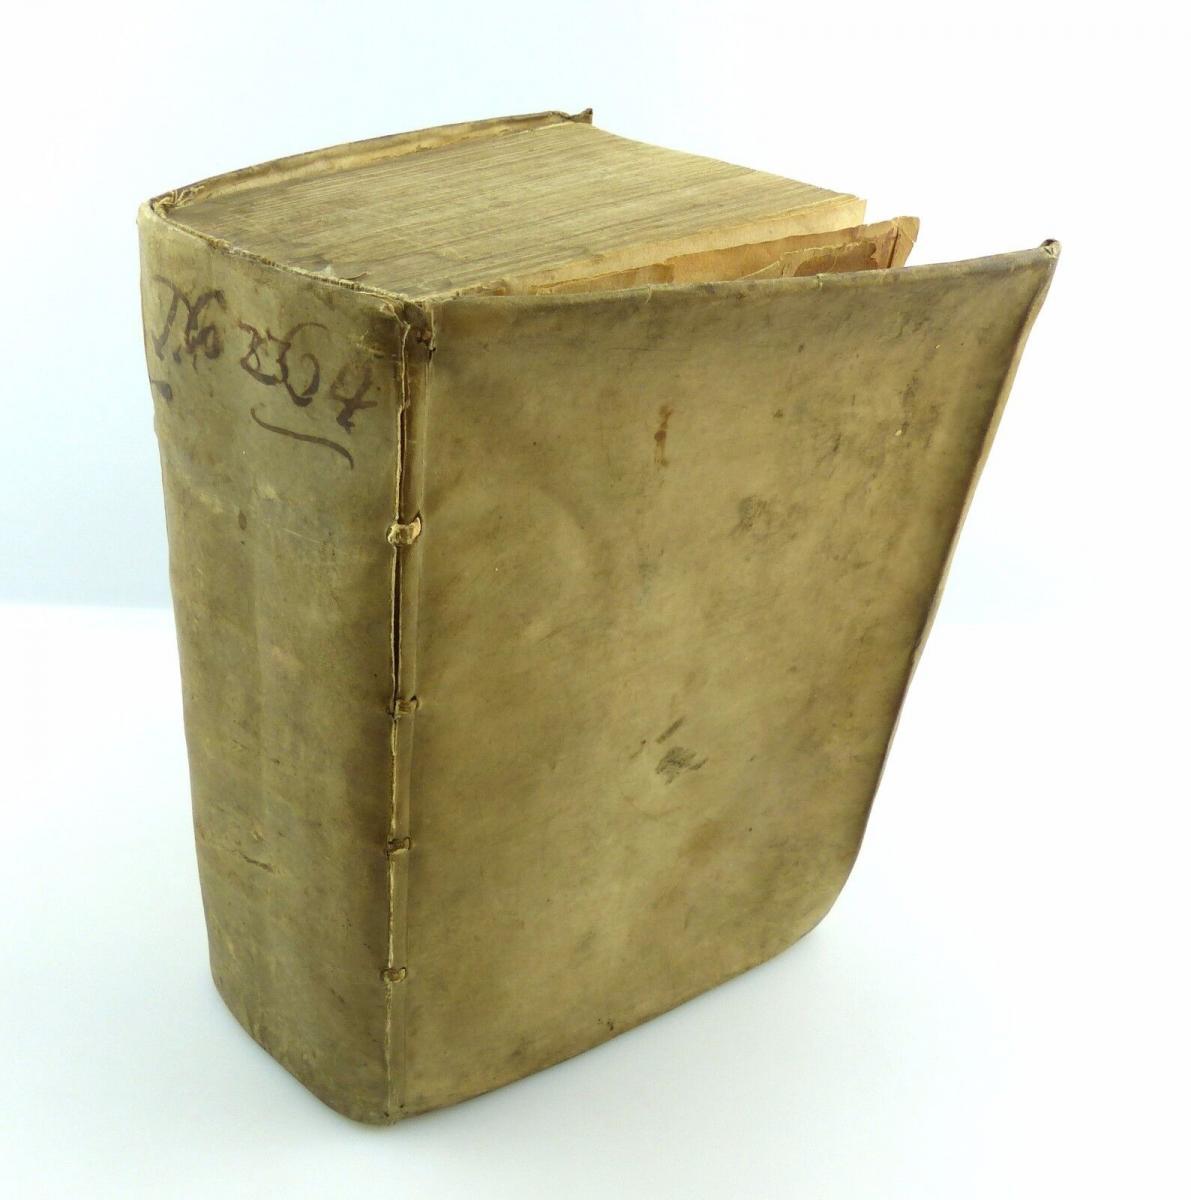 #e5213 Original altes Buch 1650 corpus juris canonici - Gesetze für Priester